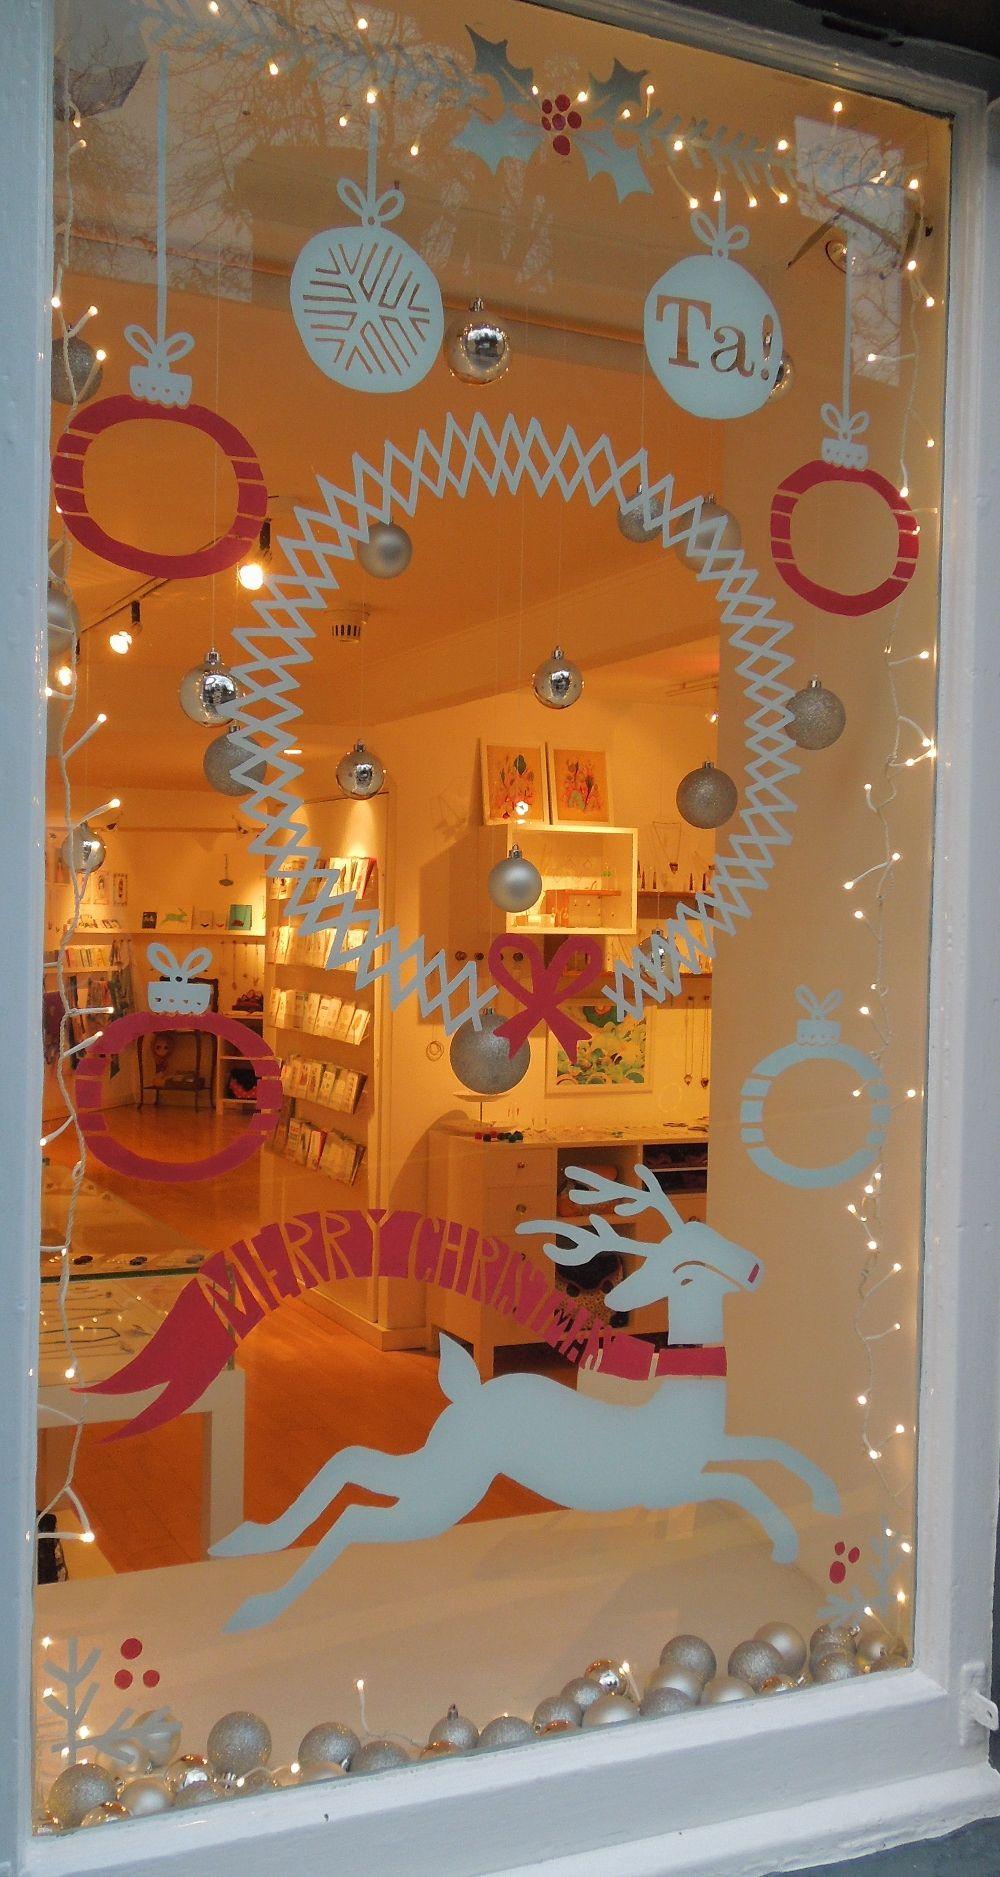 Our Christmas Window! | Christmas window decorations, Xmas ...